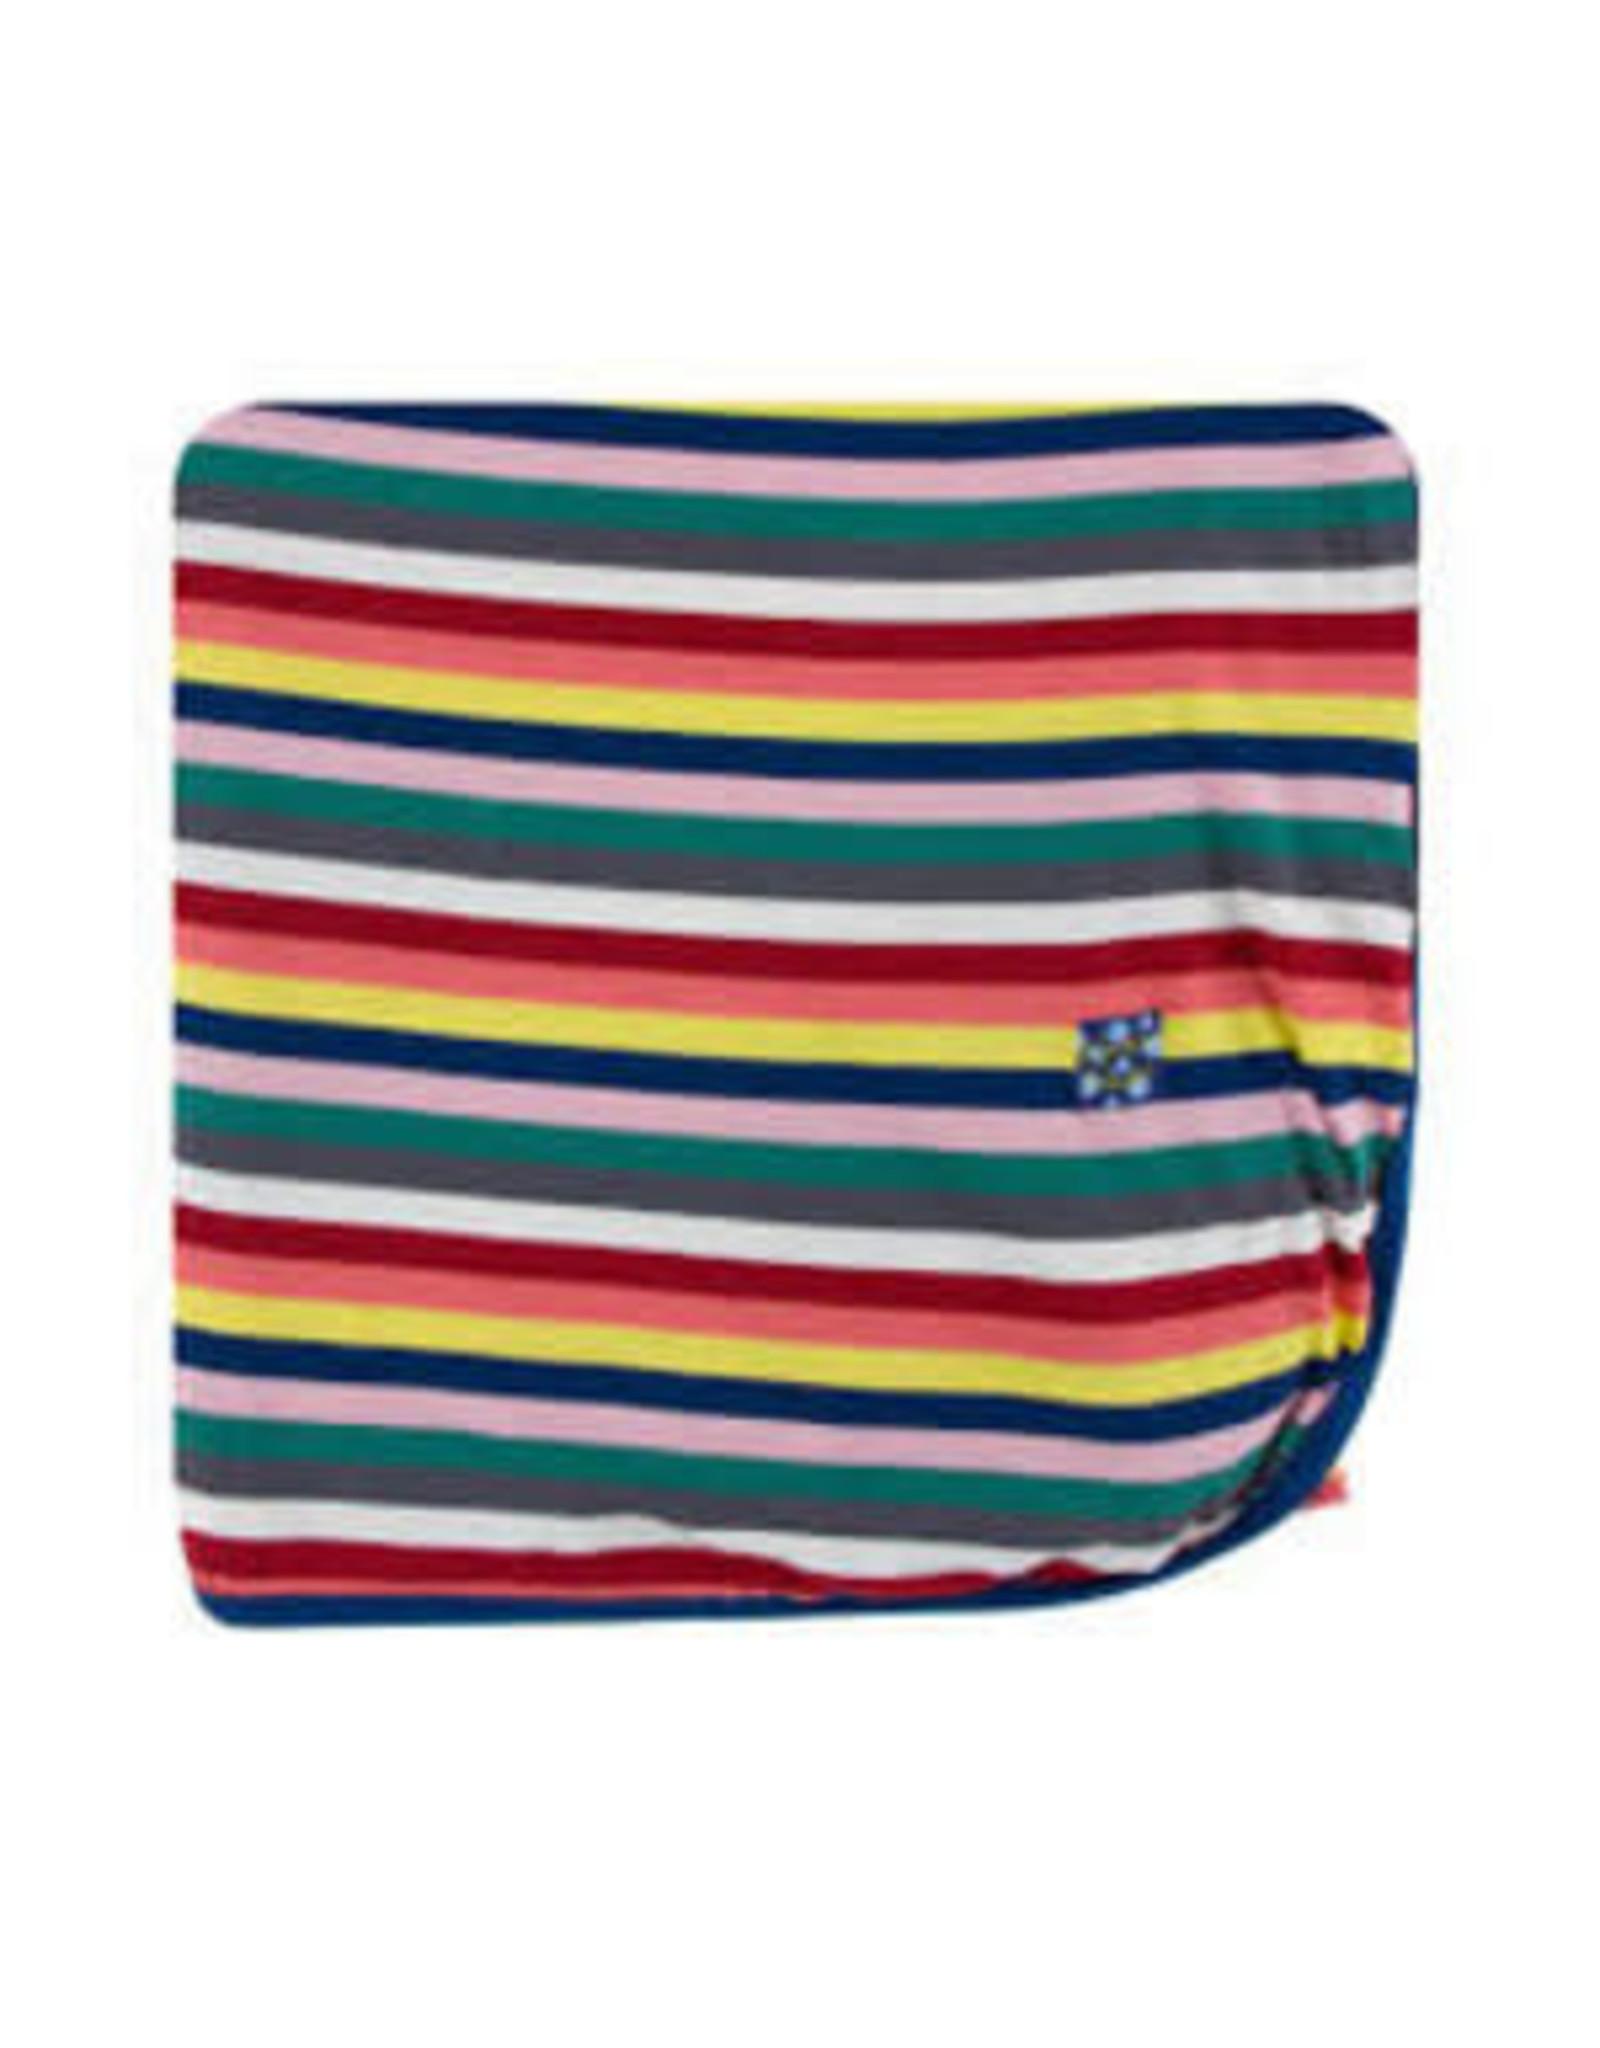 KicKee Pants Kickee Pants Print Throw Blanket, Bright London Stripe